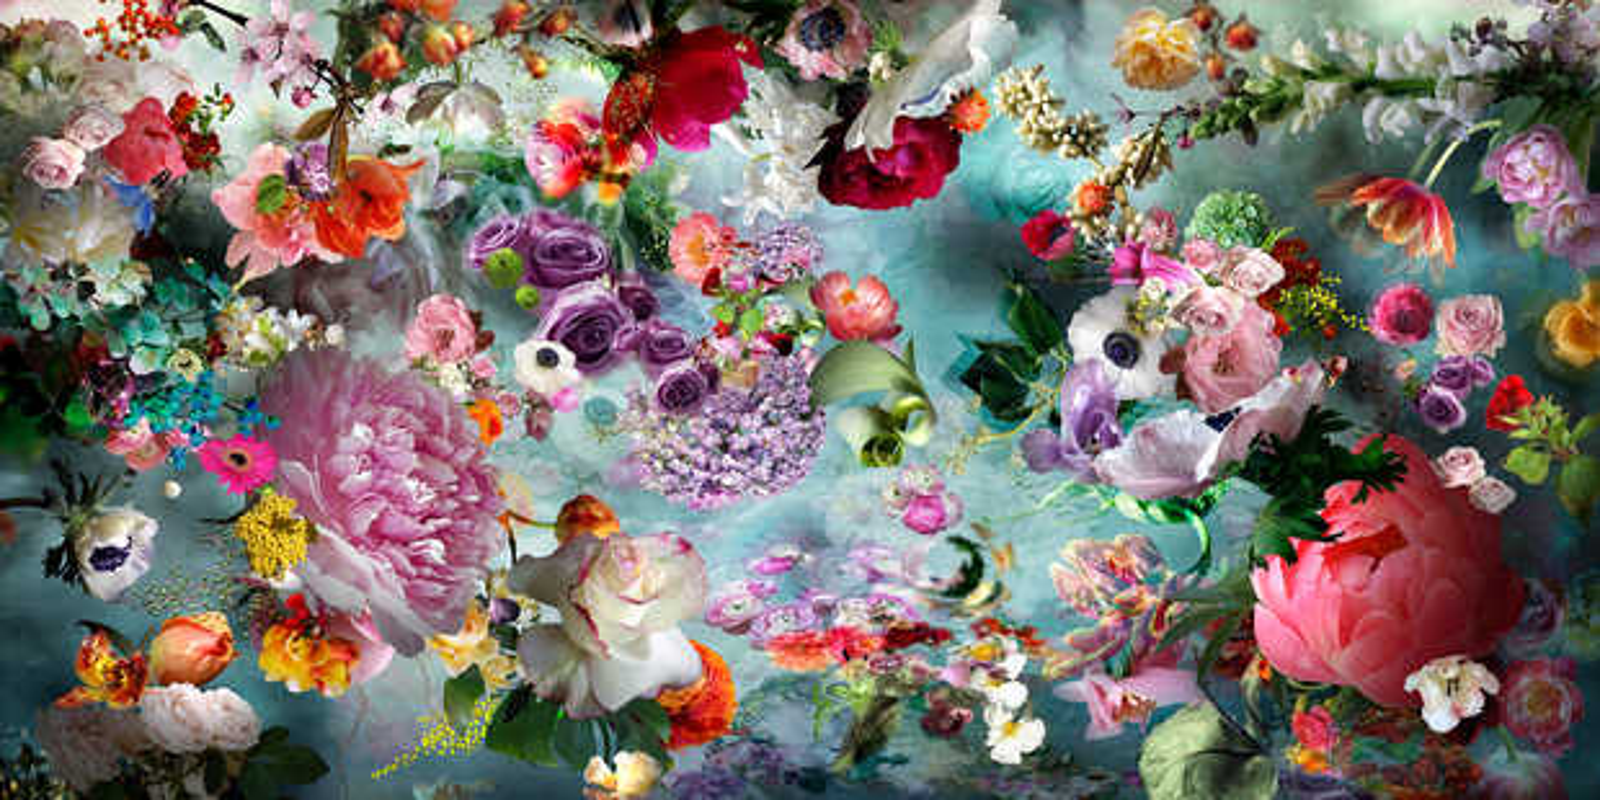 I'll Be Your Summer 05 - Isabelle Menin